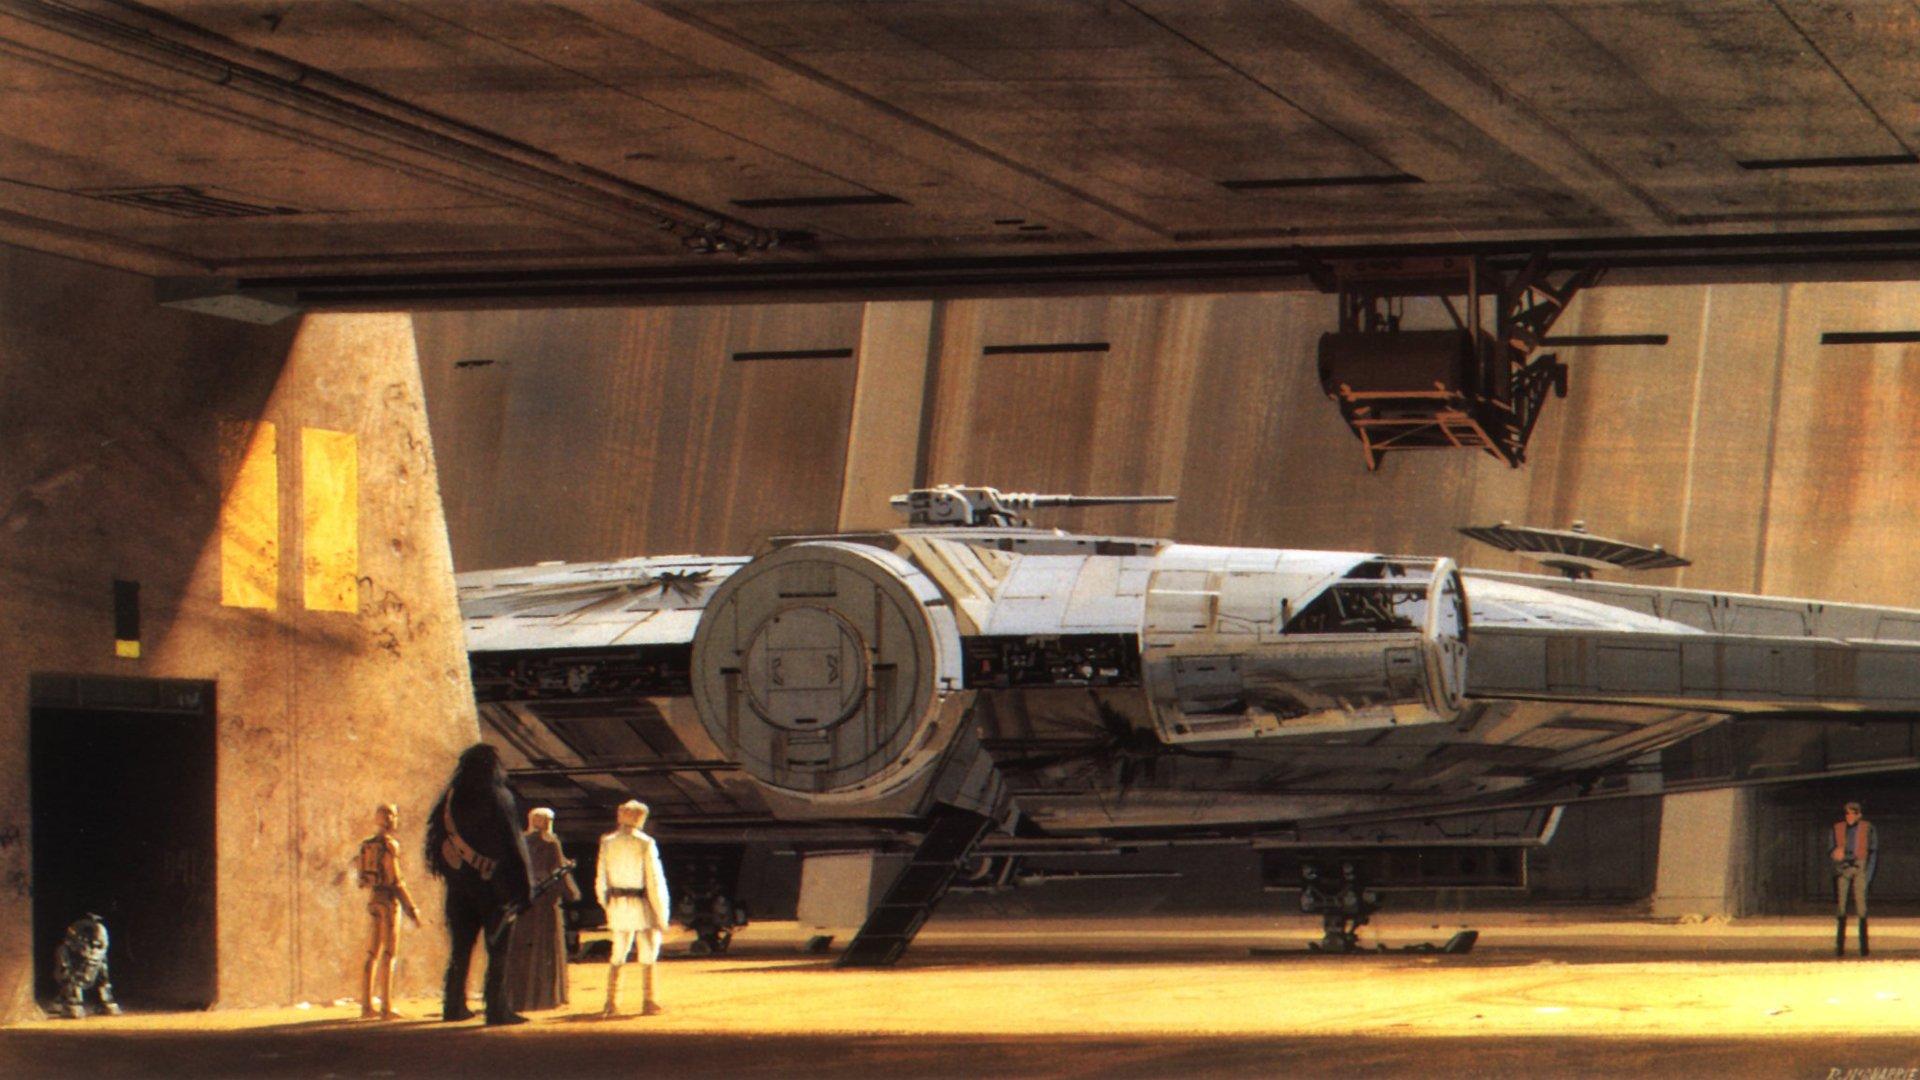 C3po R2d2 Luke Skywalker Chewbacca Millennium Falcon Obi Wan Kenobi Tatooine Star Wars New Hope Wallpaper 1920x1080 290250 Wallpaperup